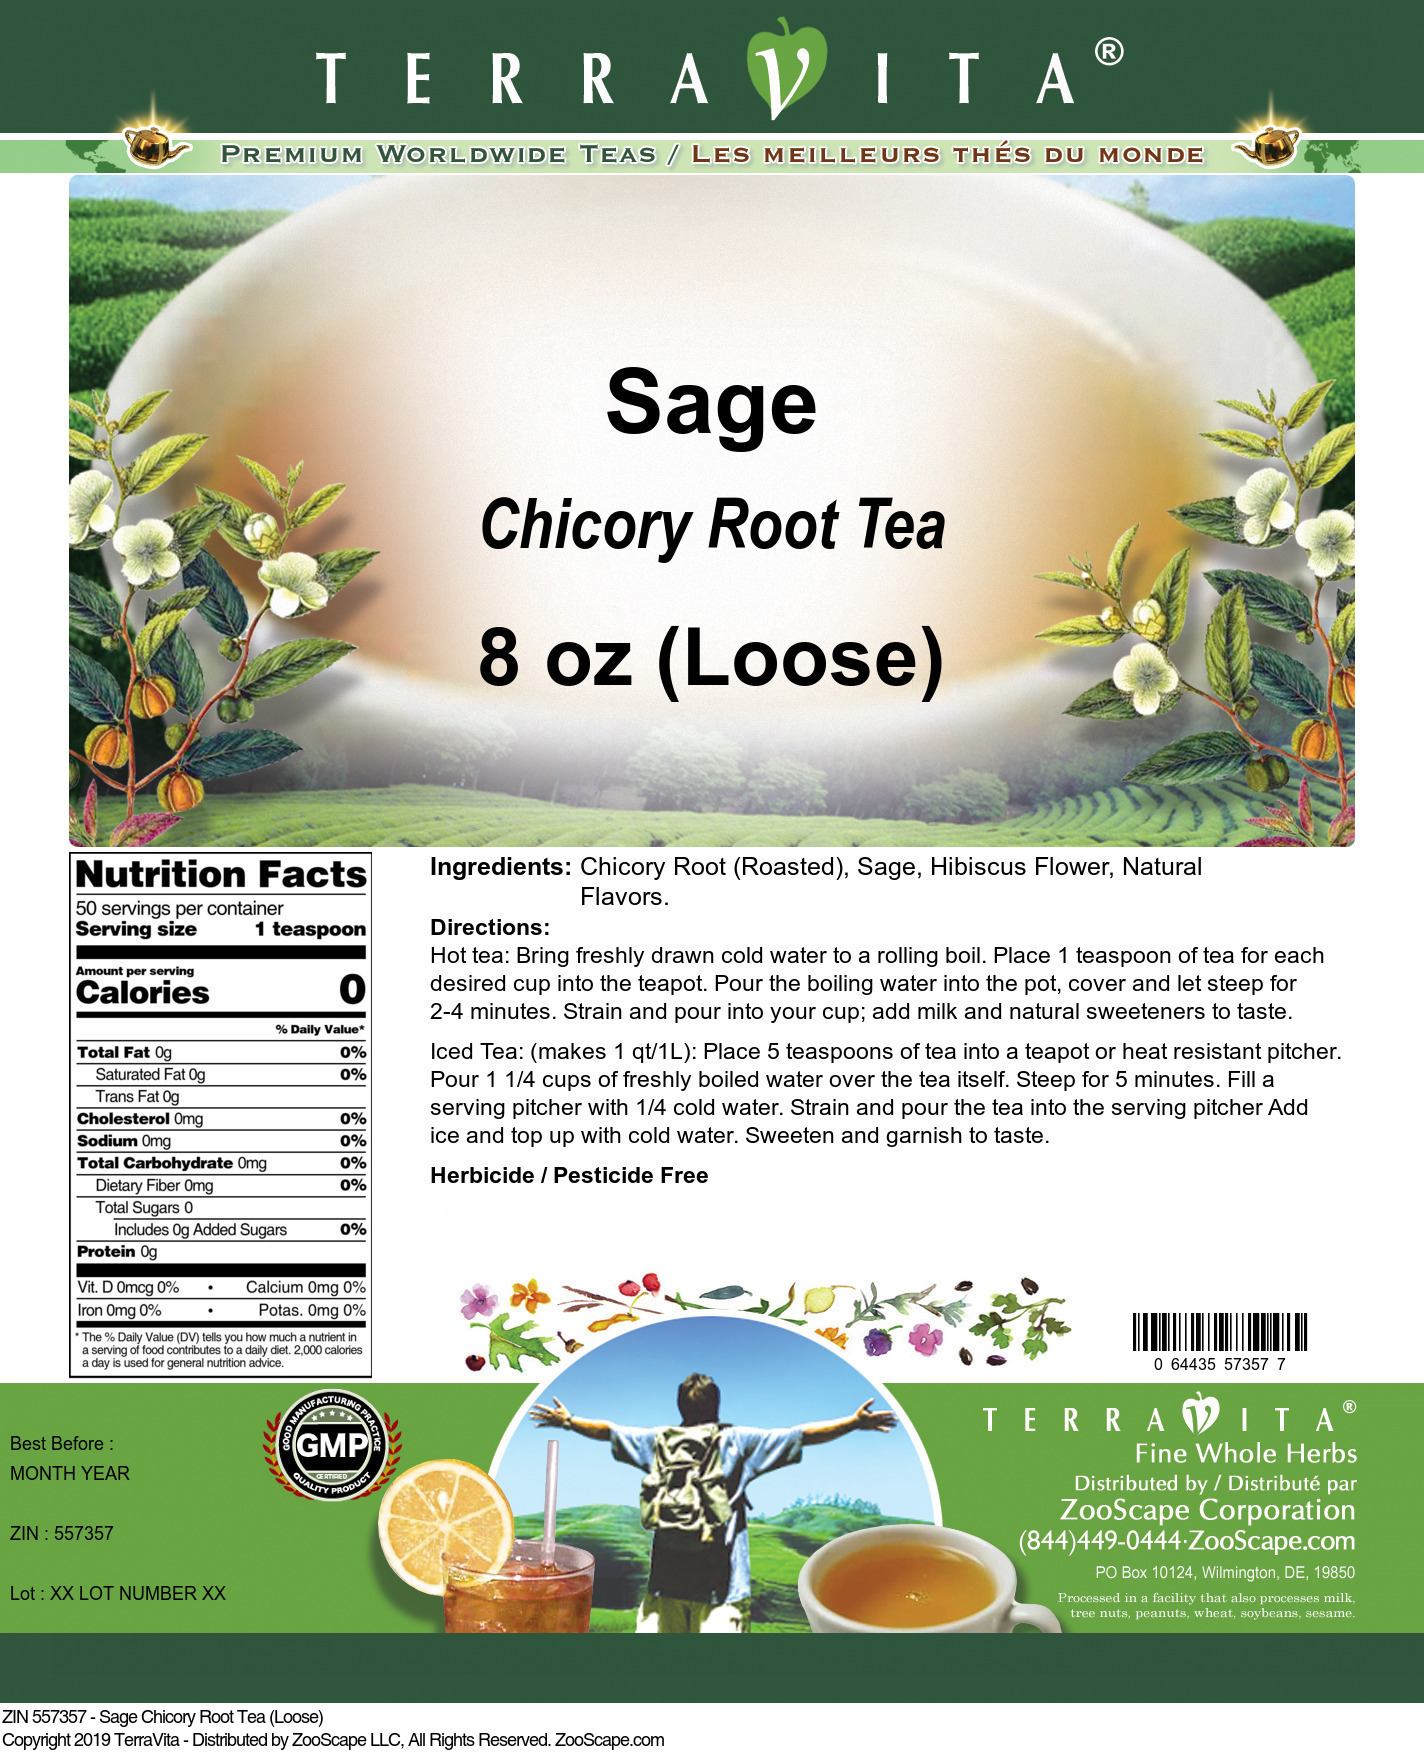 Sage Chicory Root